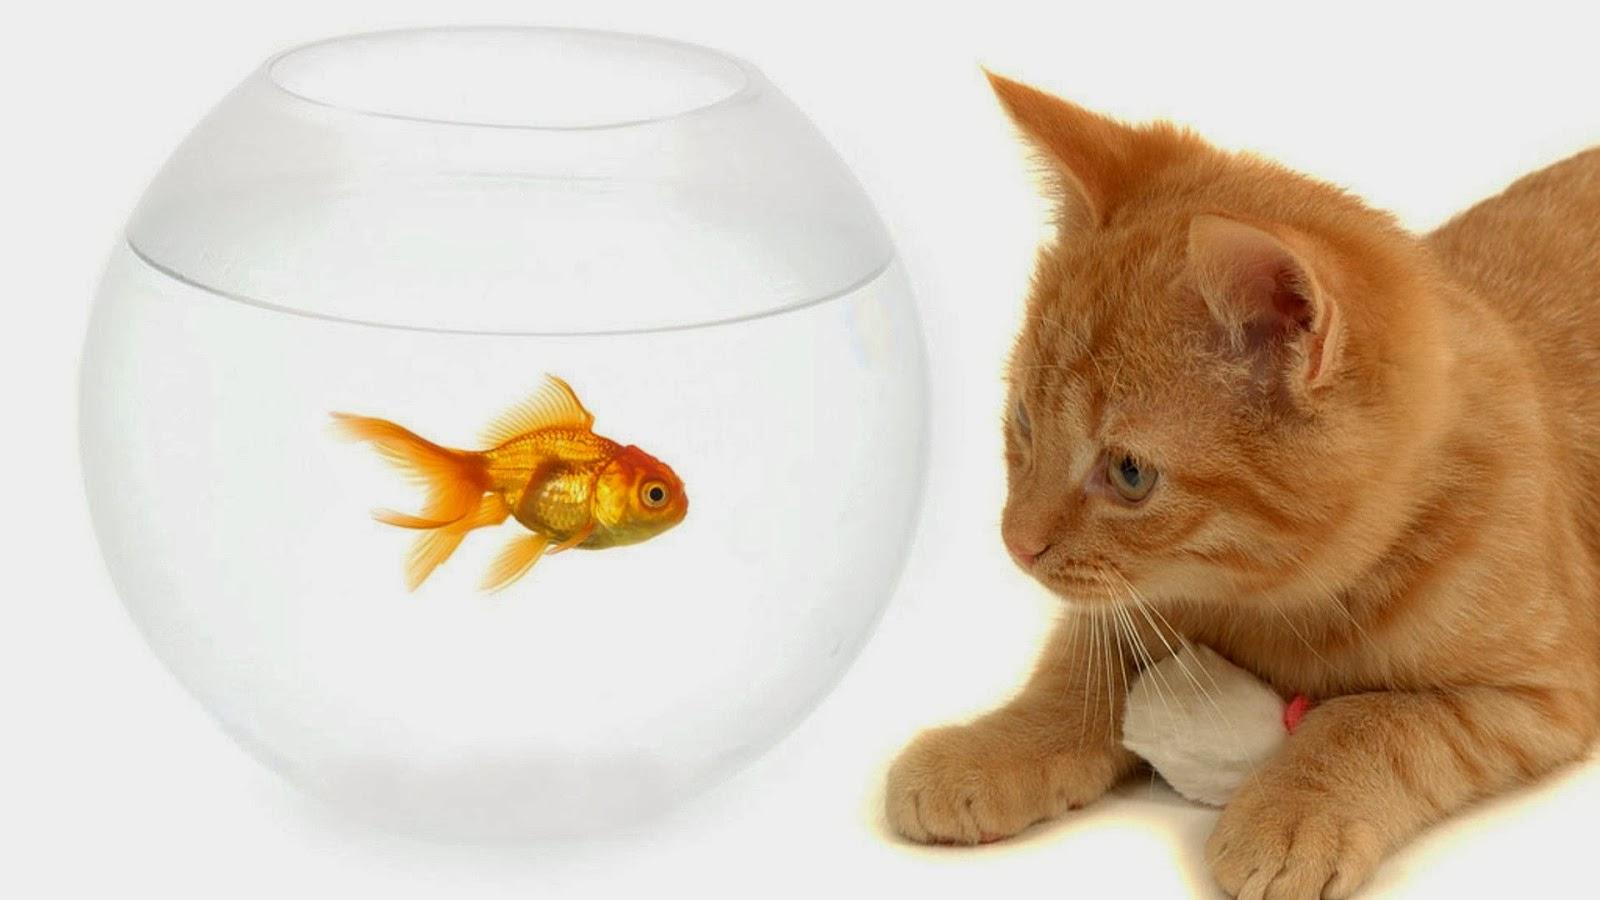 Beautiful gold fish cat 4u hd wallpaper all 4u wallpaper for Fish cat 4